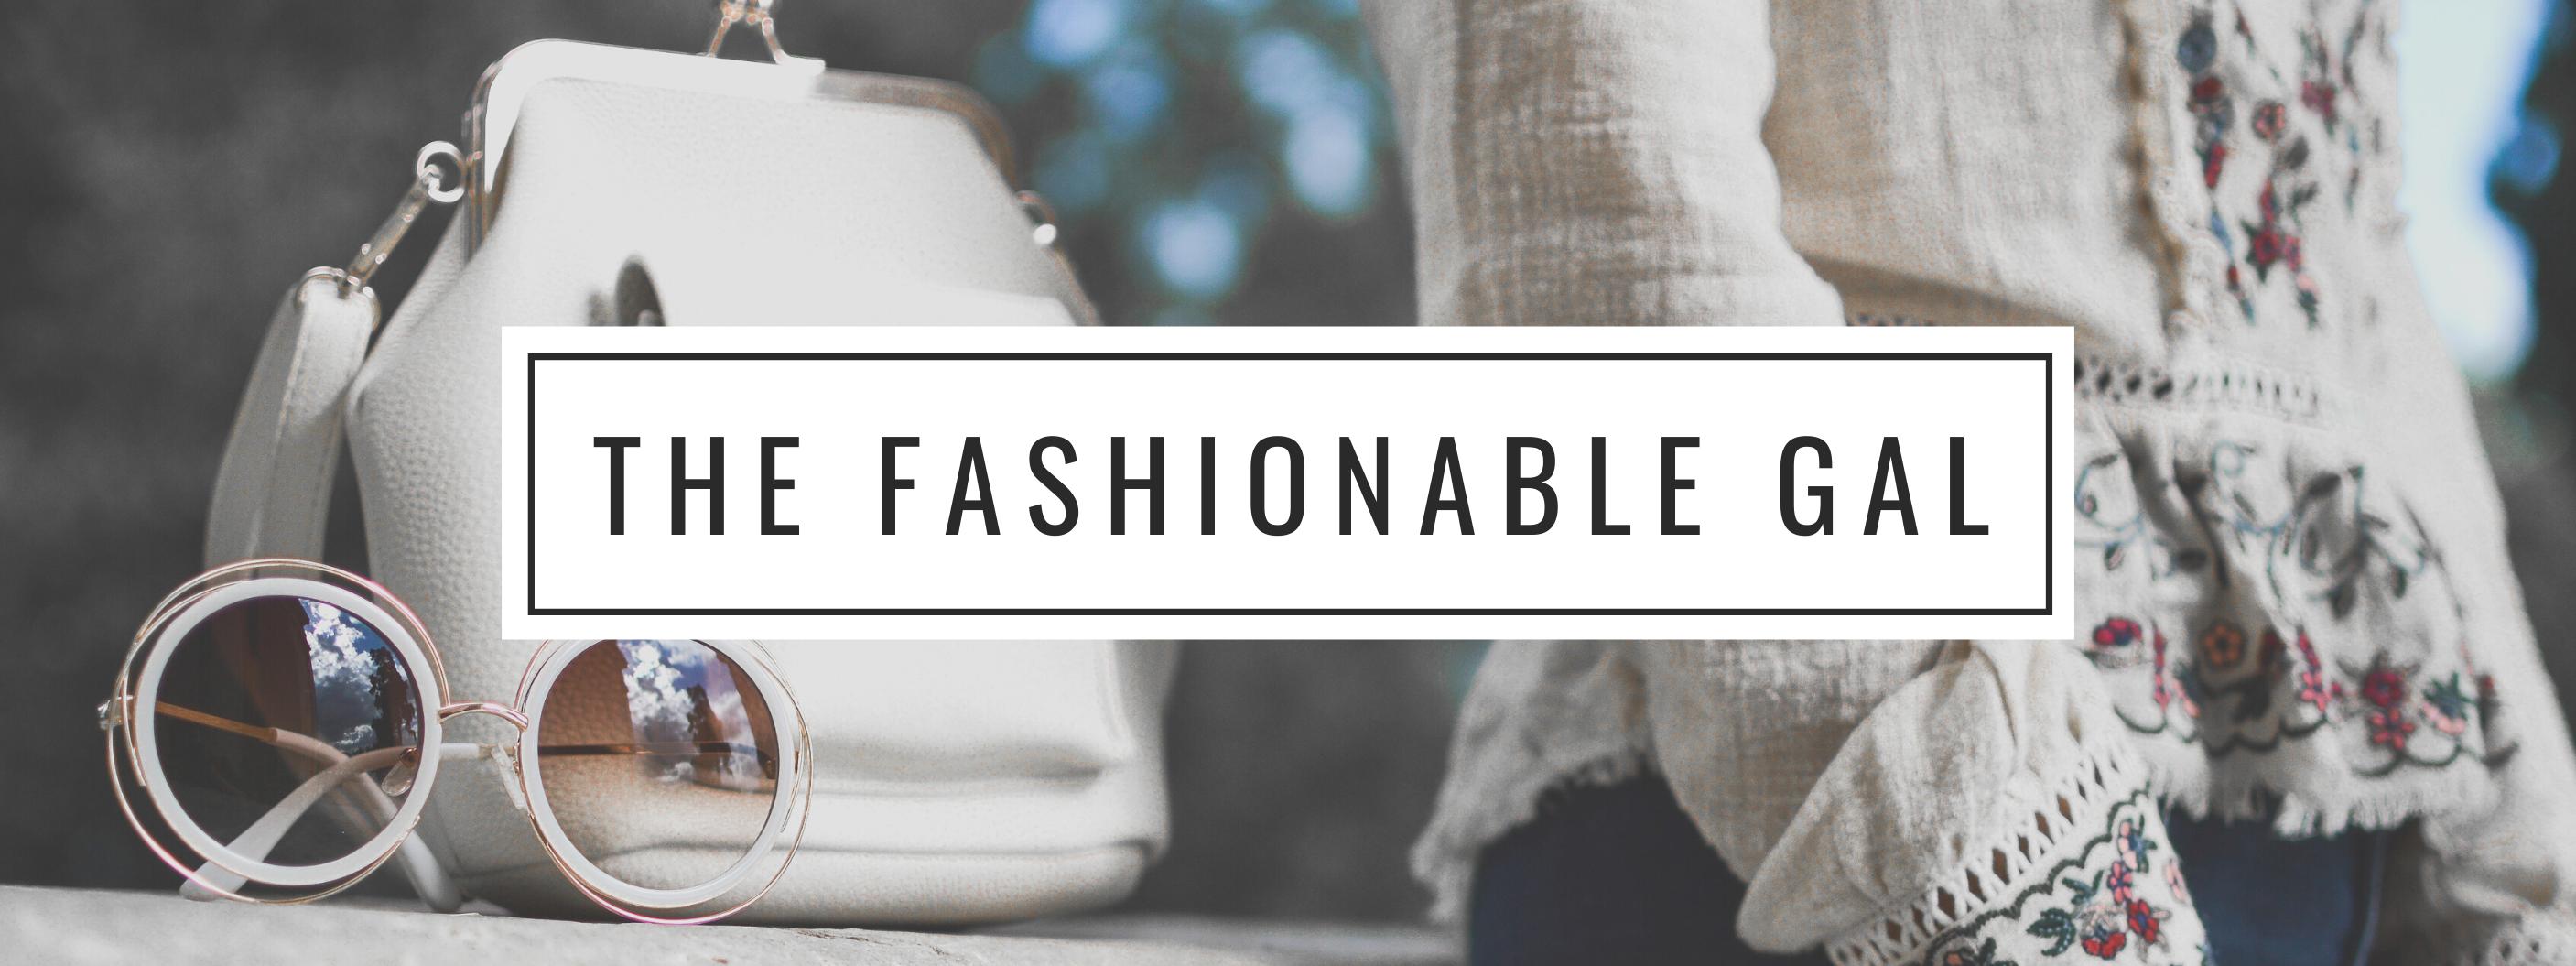 The Fashionable Gal logo